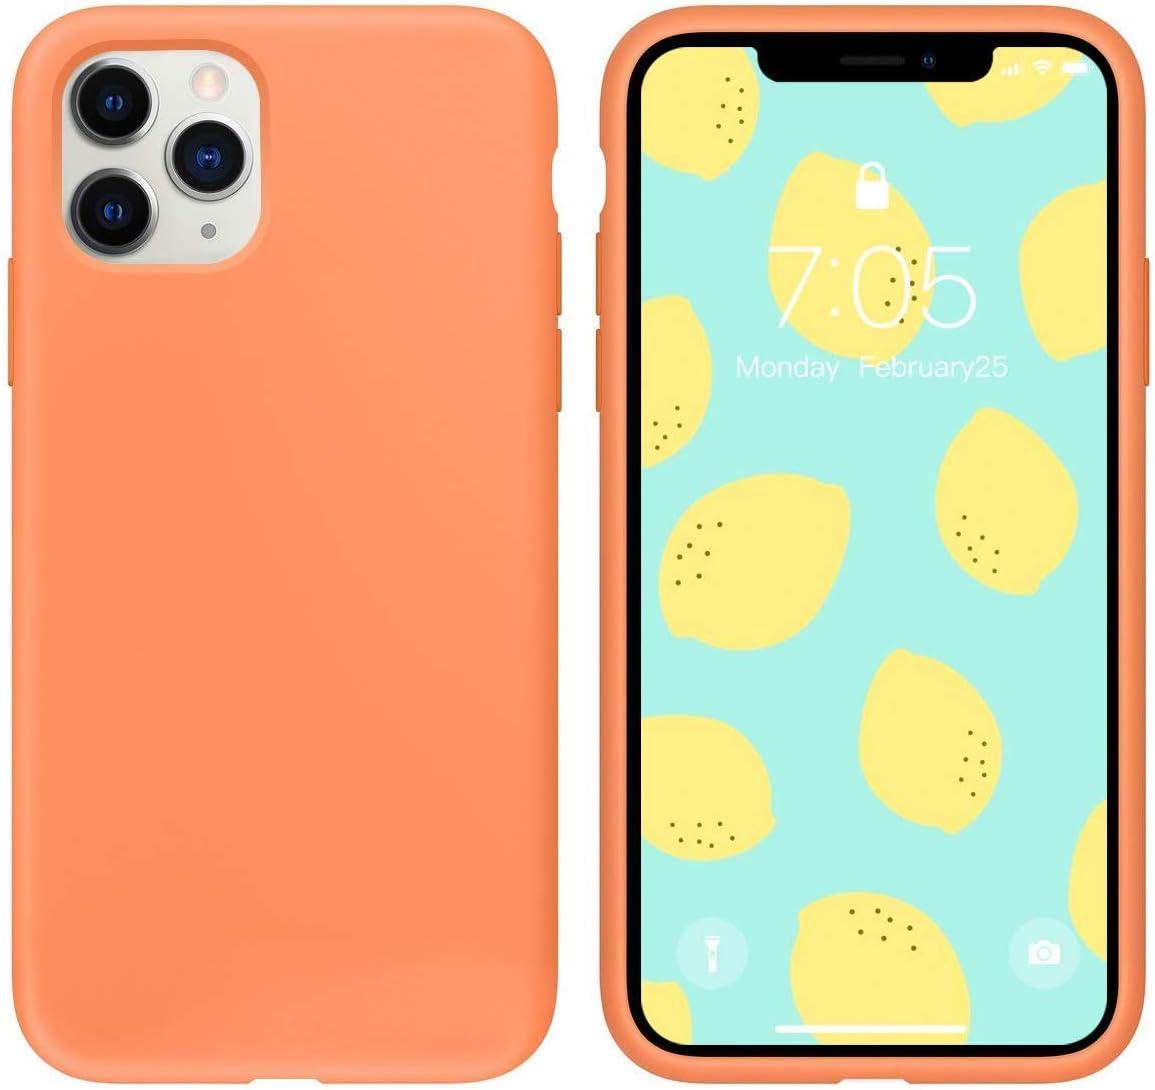 IceSword iPhone 11 Pro Max Case Orange, Thin Liquid Silicone Case, Soft Silk Microfiber Cloth, Matte Pure Orange, Gel Rubber Full Body, Cool Protective Shockproof Cover 6.5